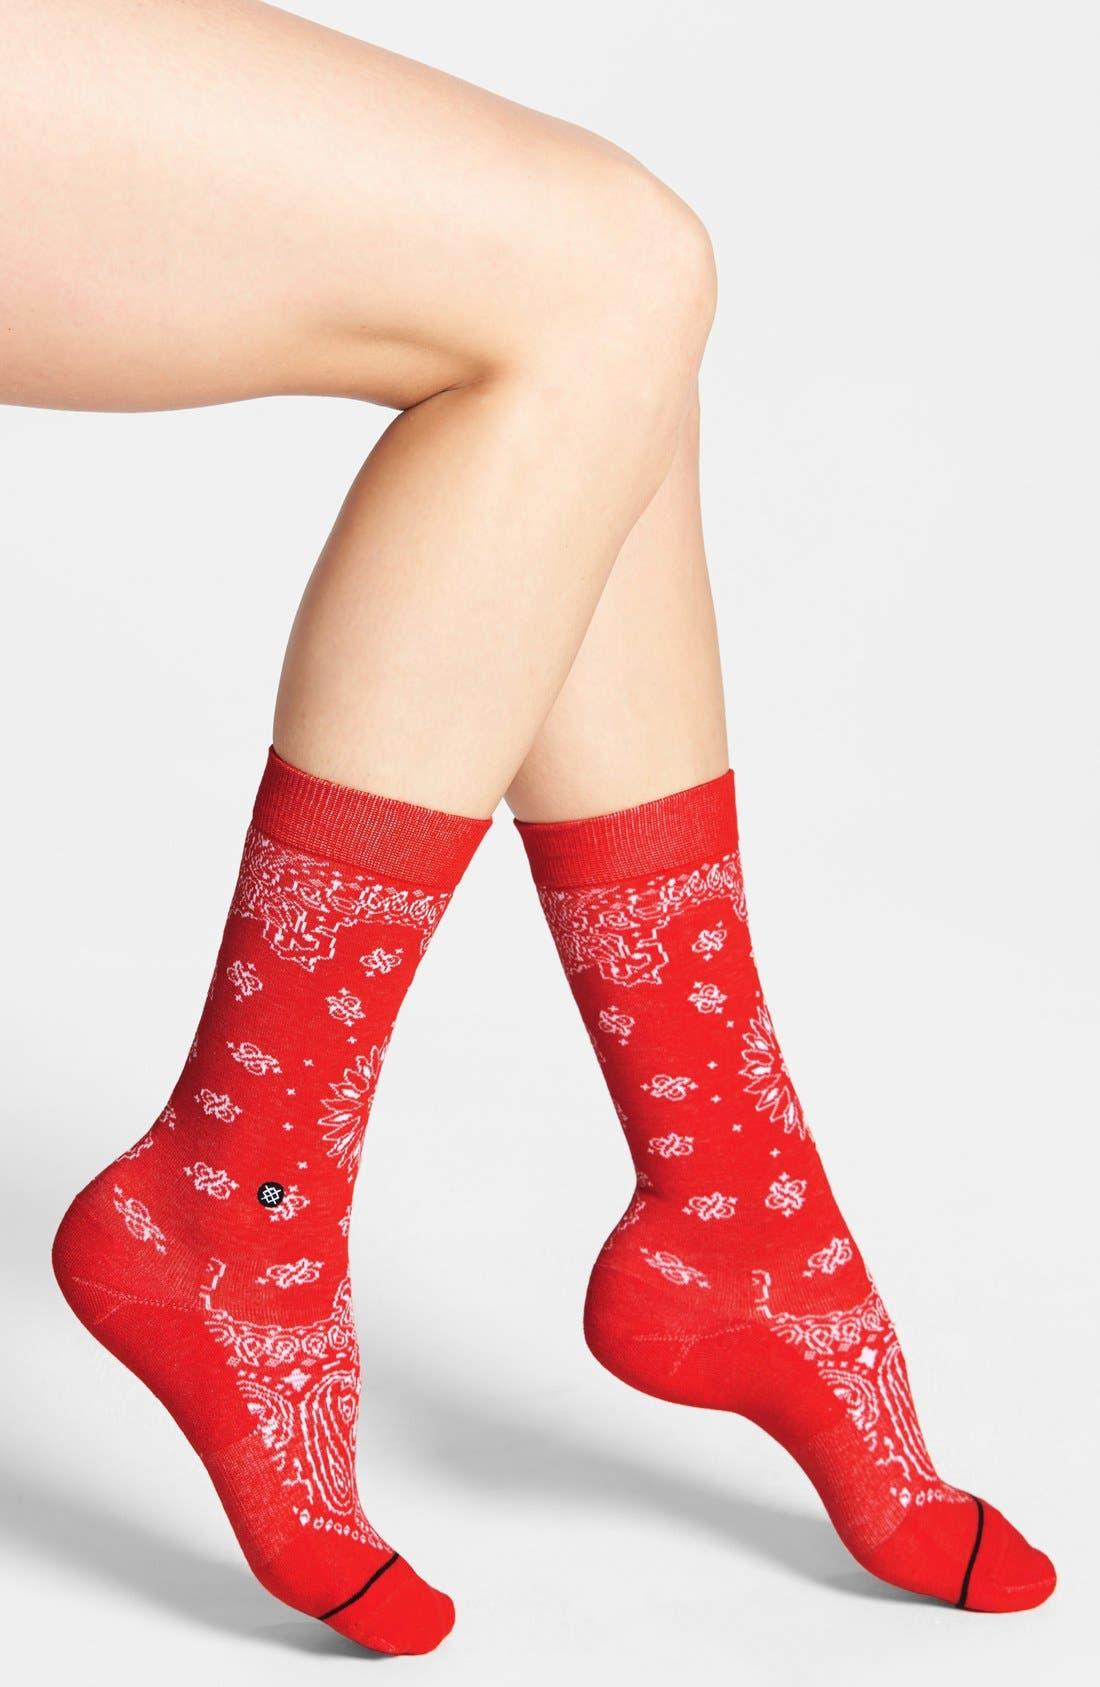 Main Image - Stance 'Vata' Socks